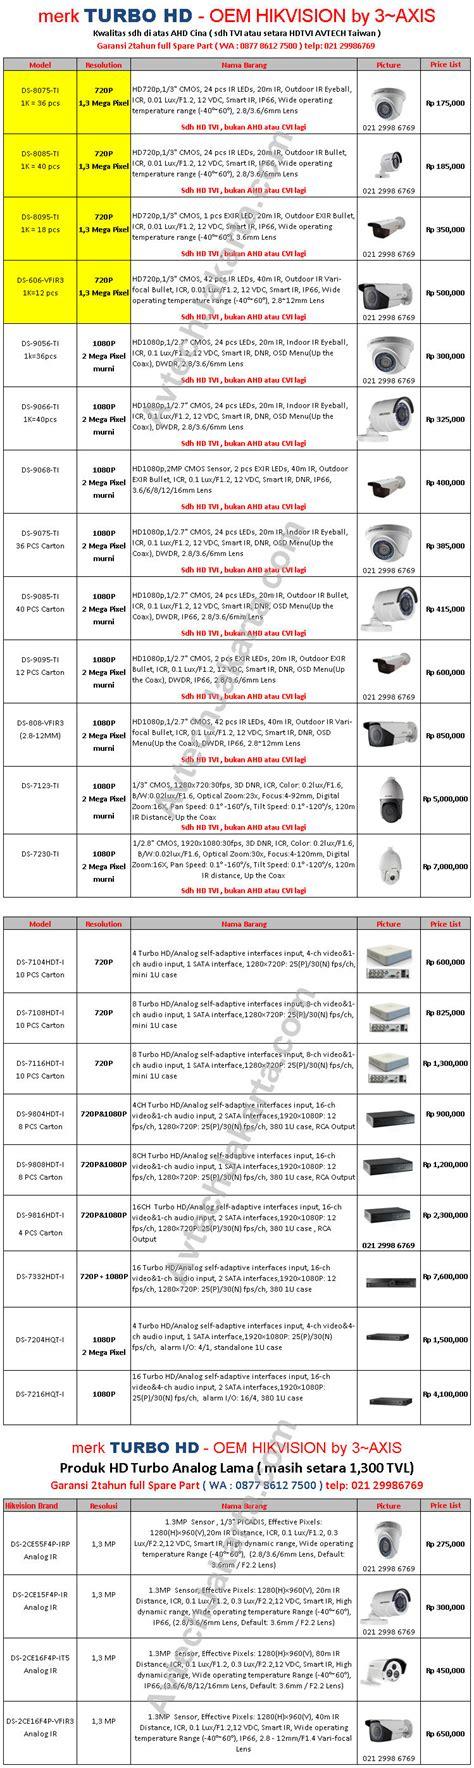 Harga Cctv Hd daftar harga cctv dvr merk turbo hd paket